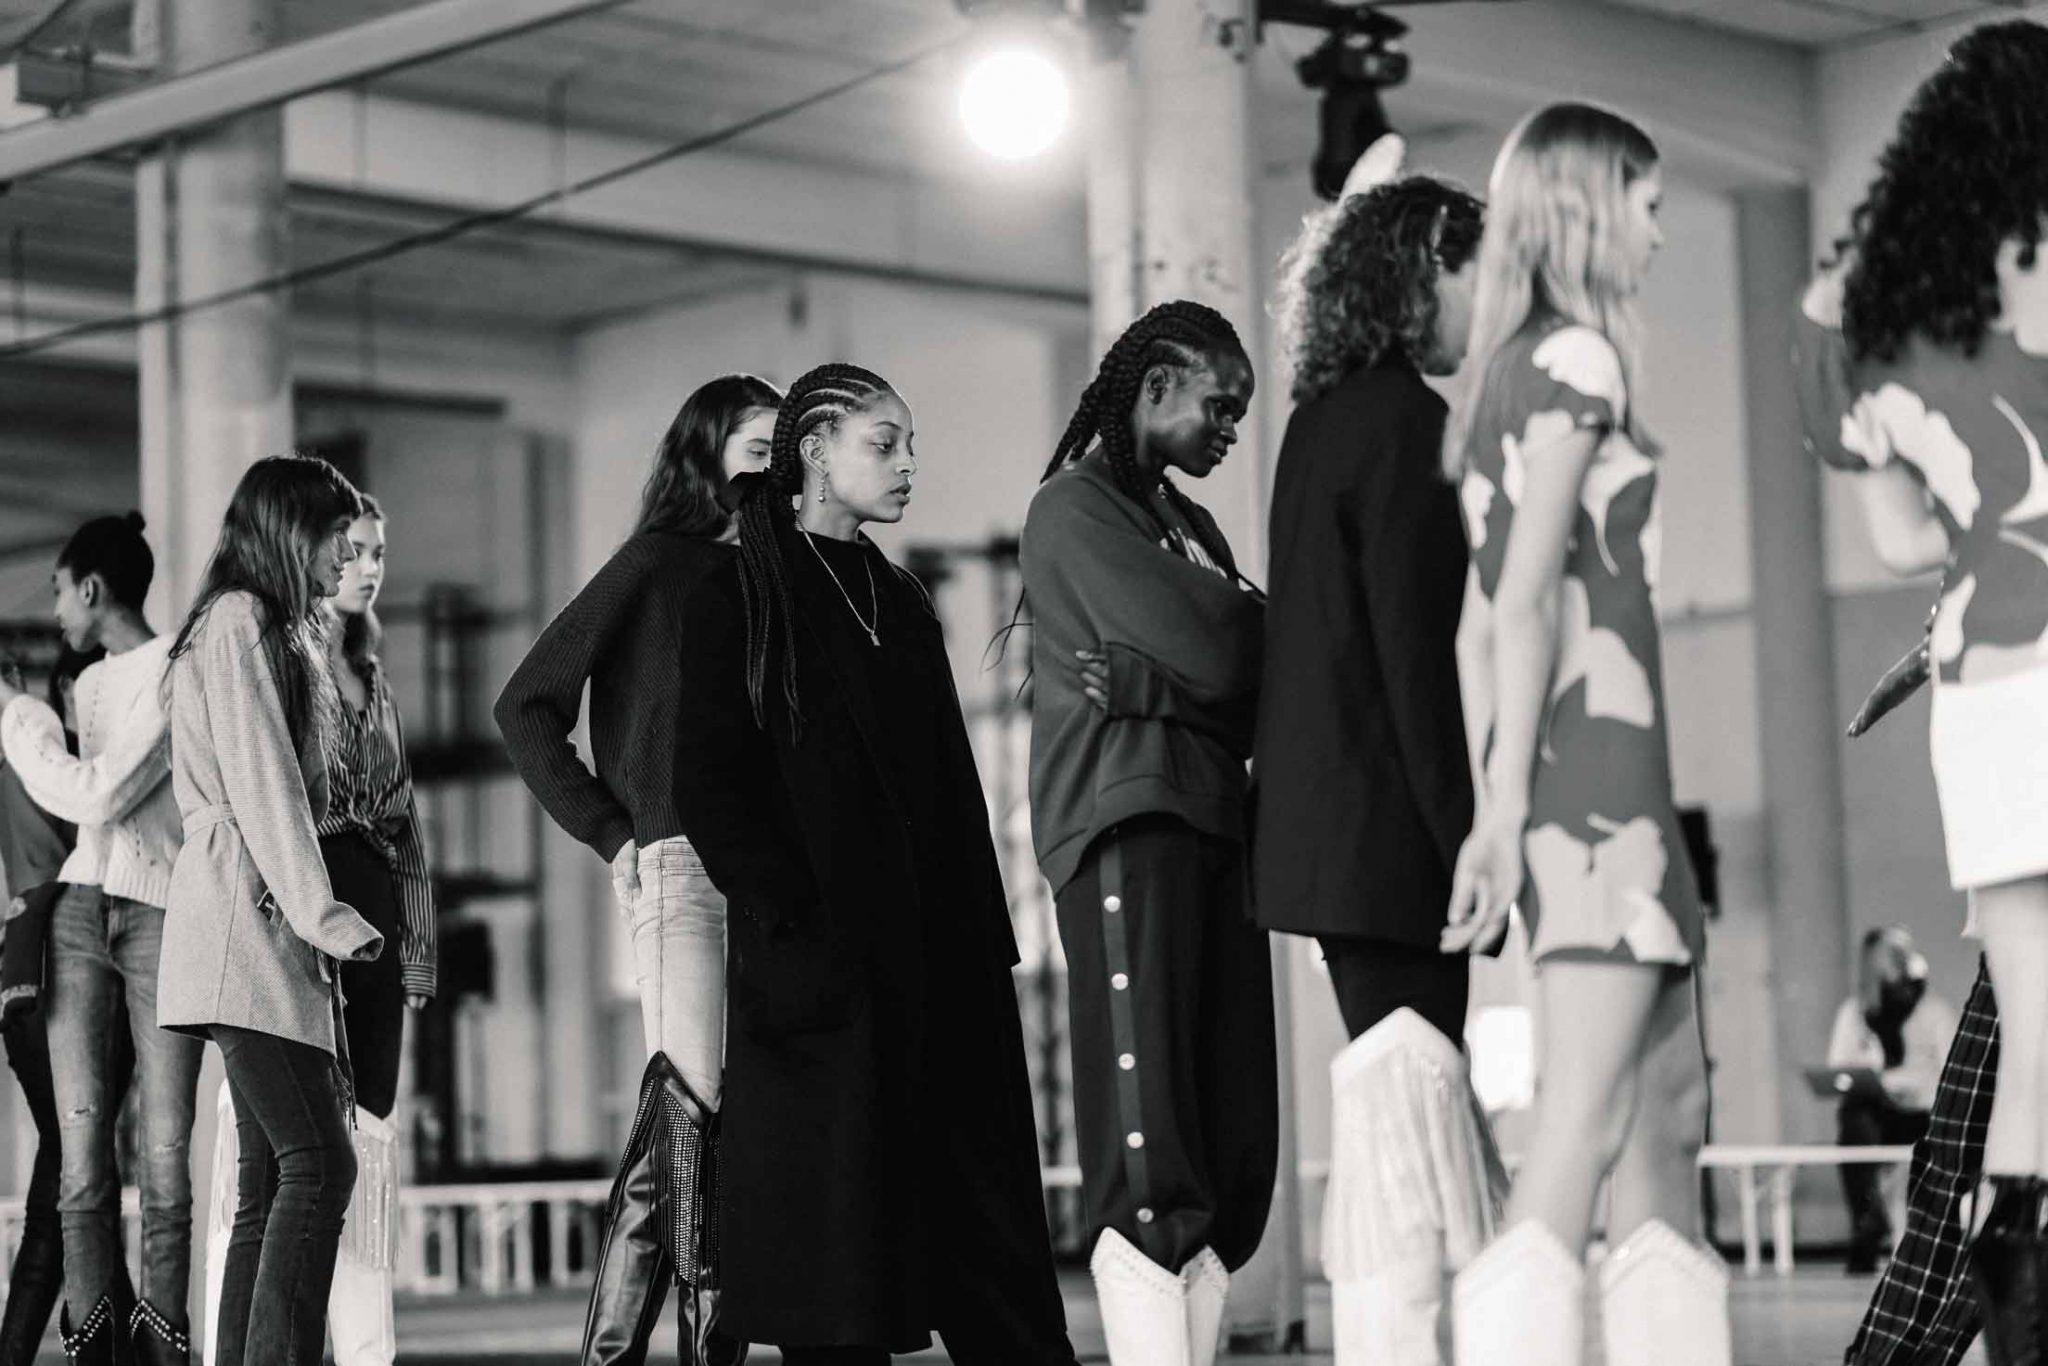 Ilsoo_van_Dijk_Ilsoovandijk_AFW_Toral_Backstage_Amsterdam_Fashion_week_2020_-scaled_5a